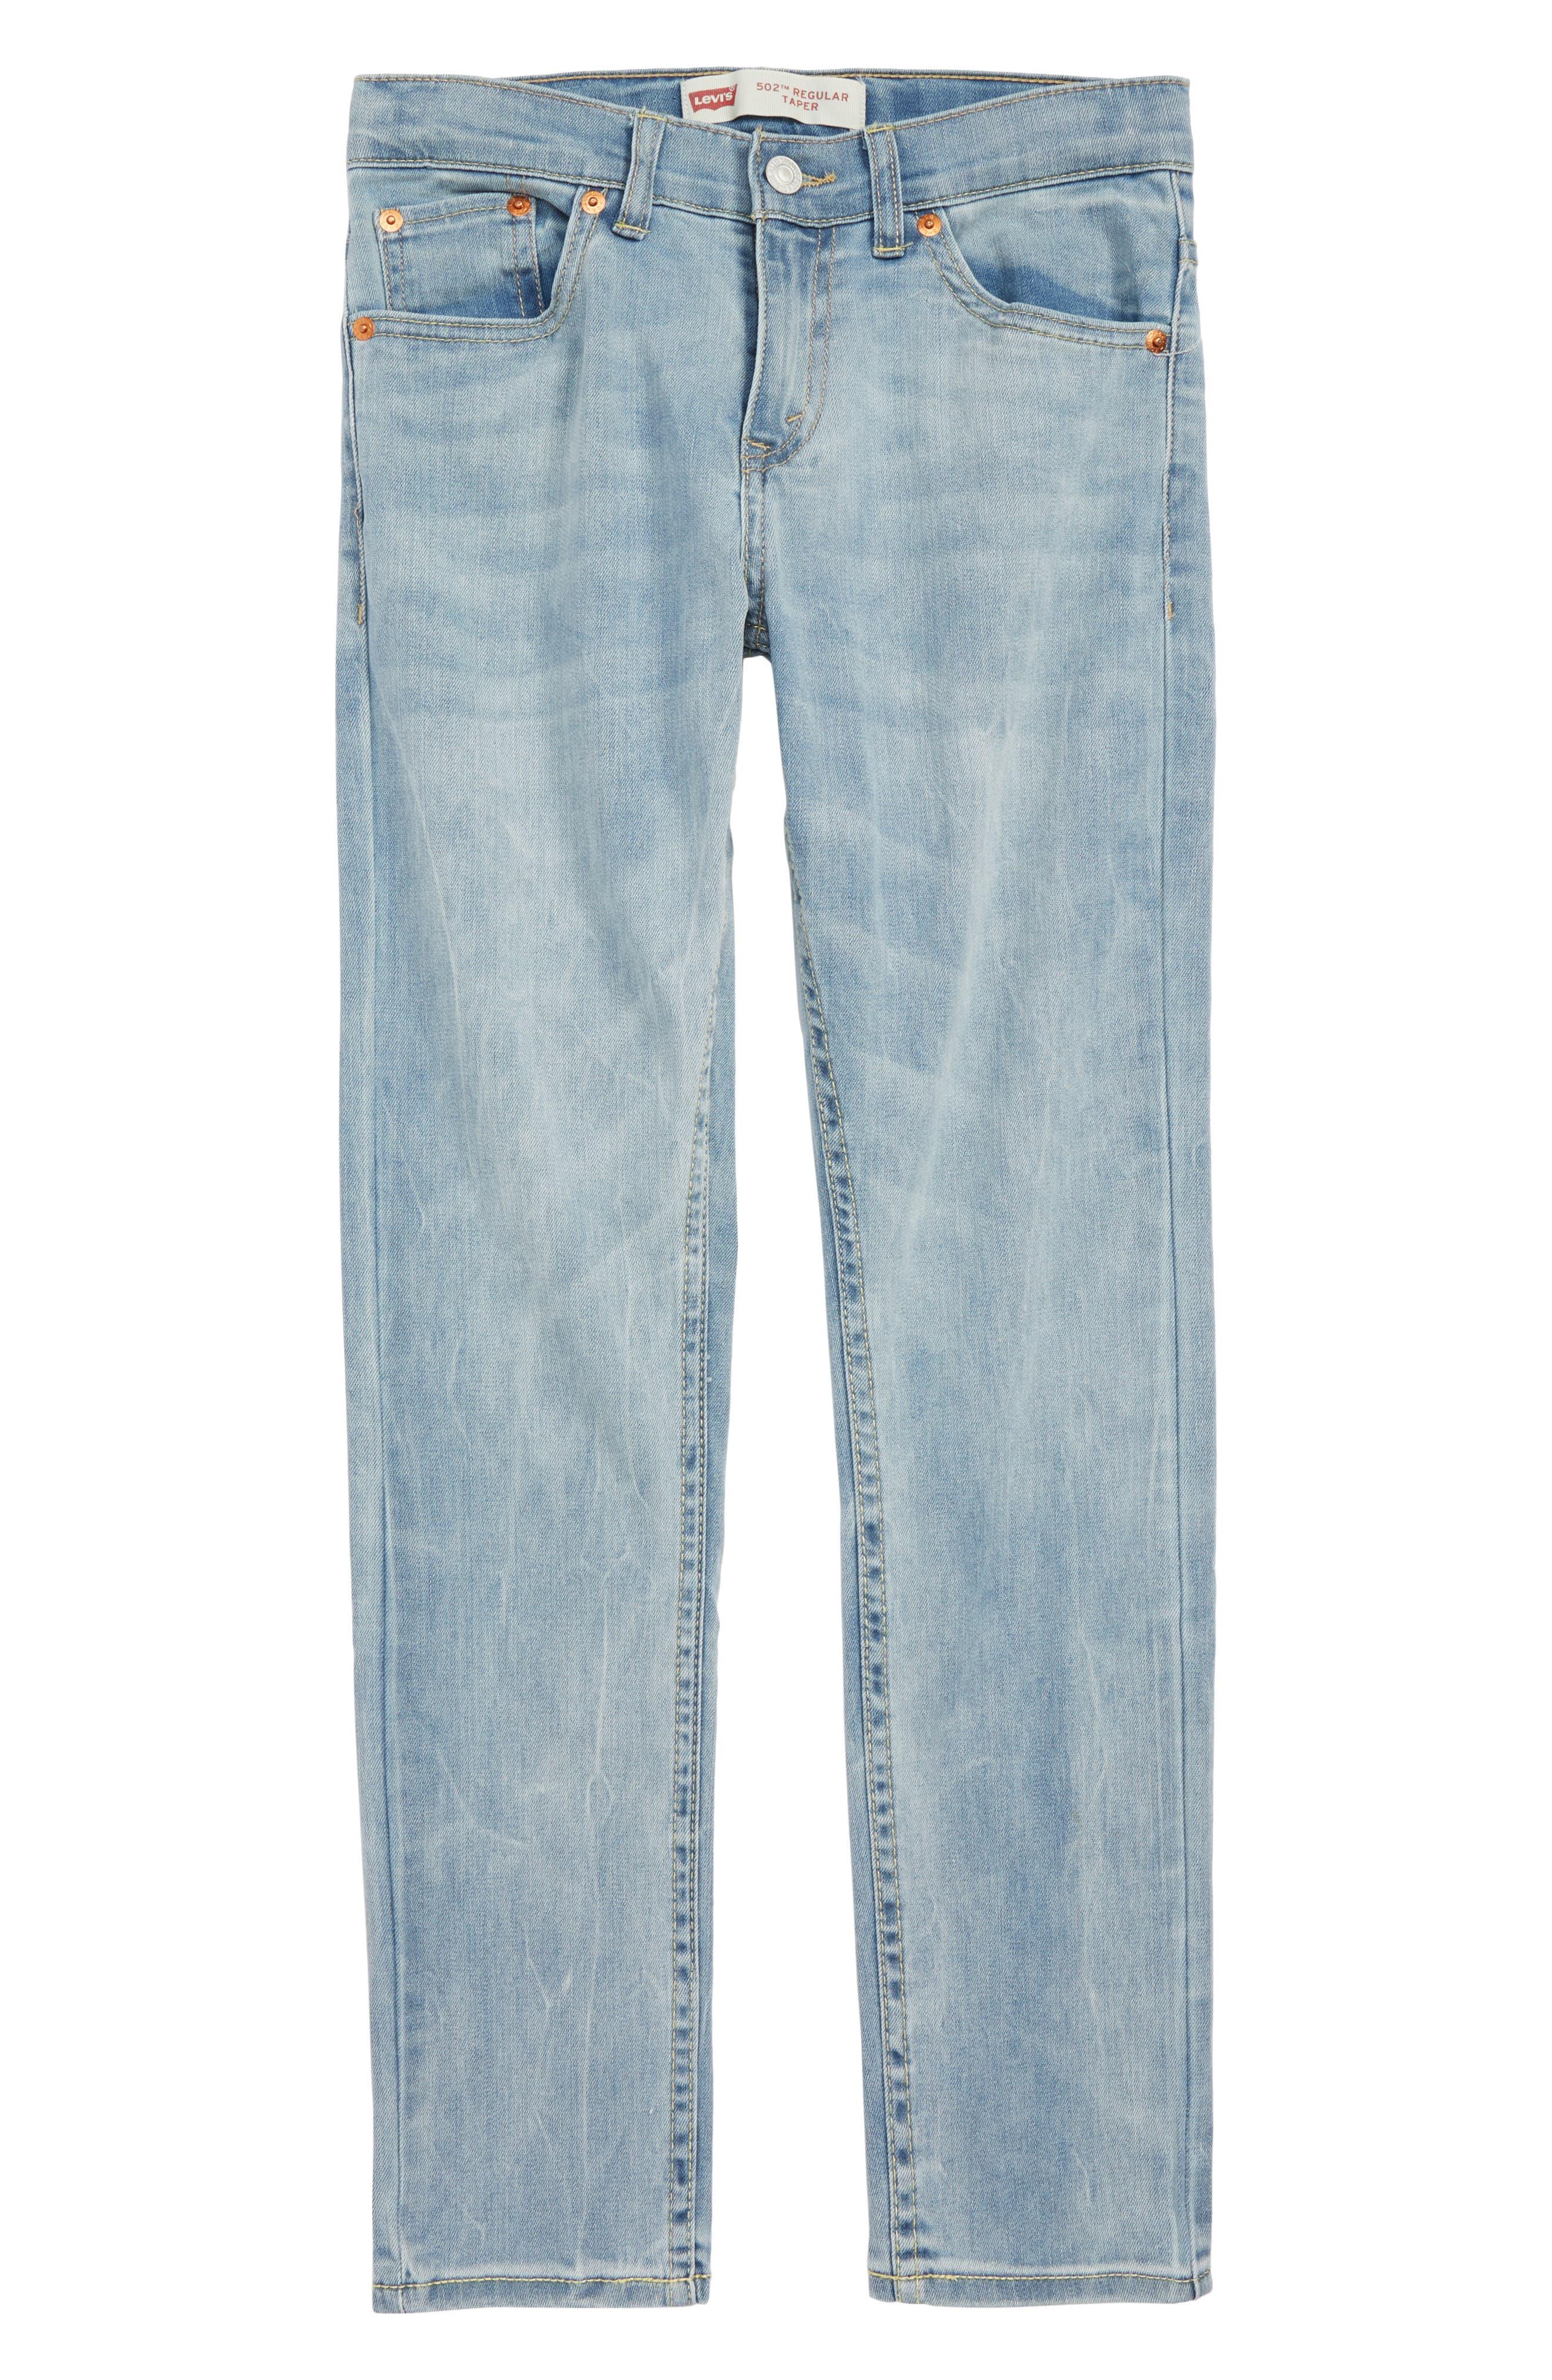 LEVI'S<SUP>®</SUP>,                             Levi's<sup>®</sup> 502<sup>™</sup> Regular Taper Jeans,                             Main thumbnail 1, color,                             YOSEMITE FALLS